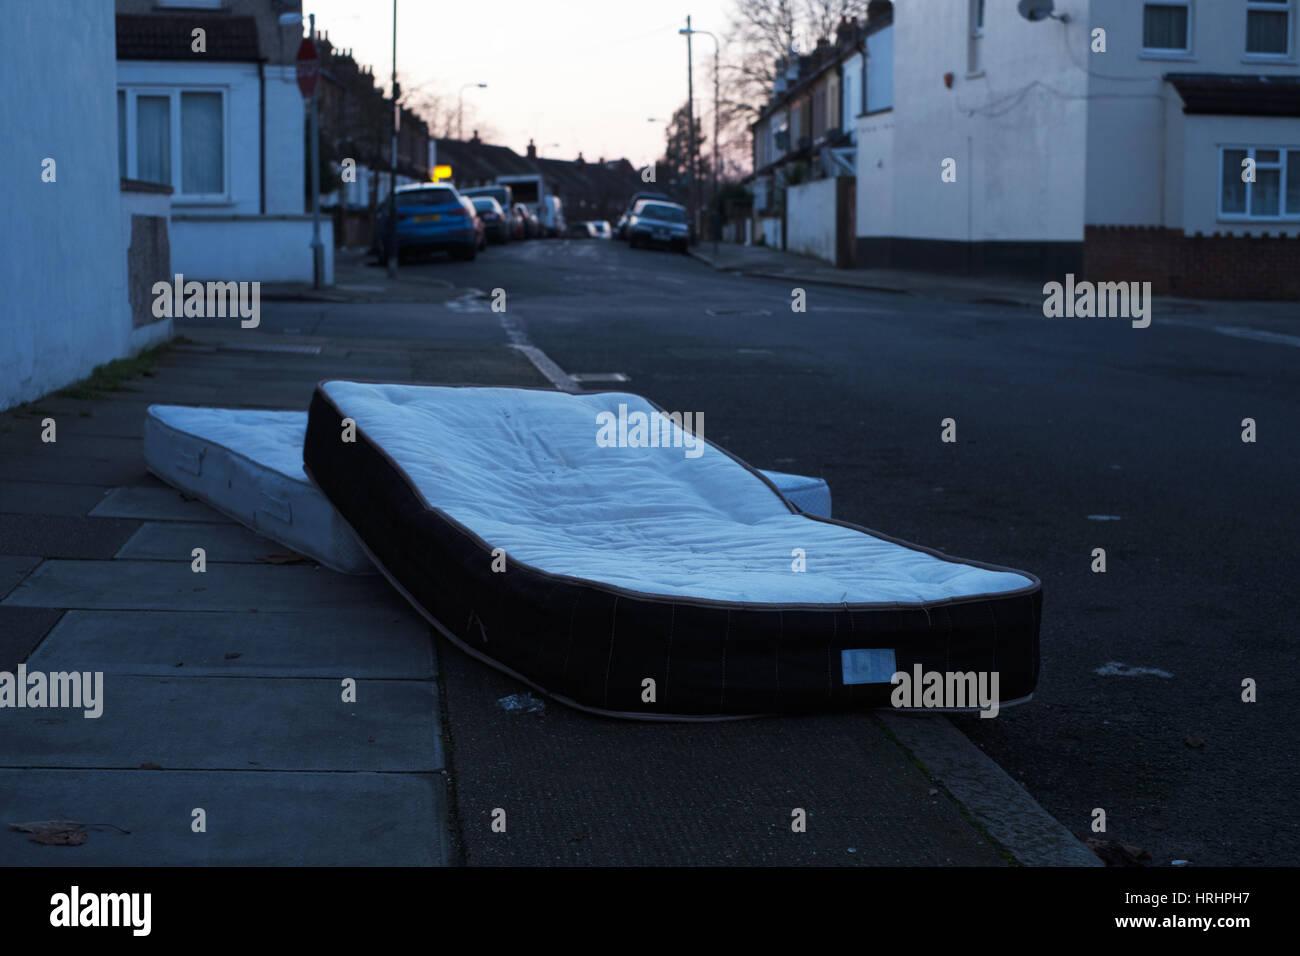 Abandoned mattresses - Stock Image